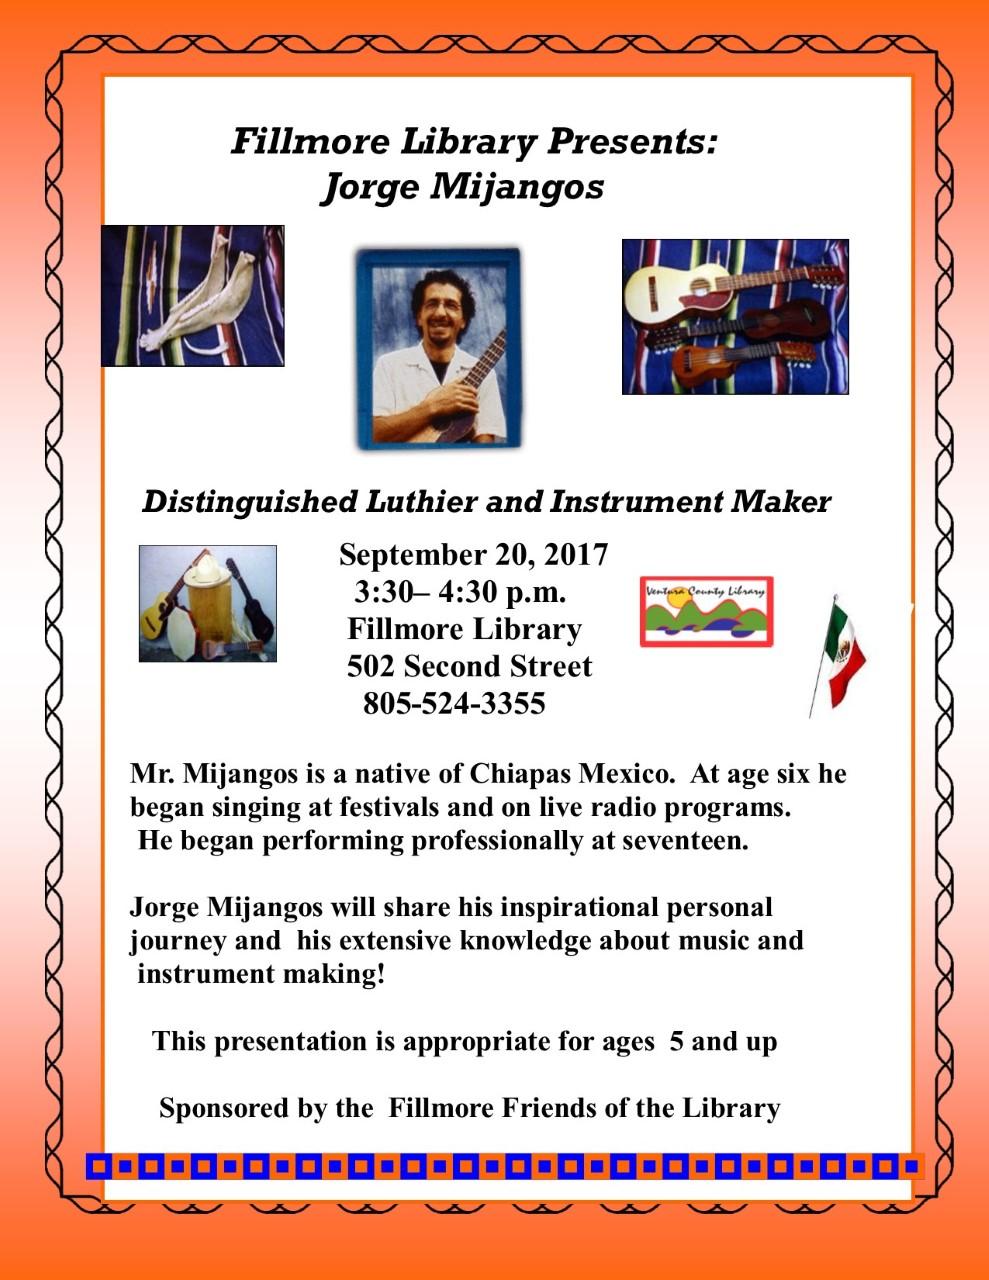 Wed Sept 20, 2017 Jorge Mijangos.jpg